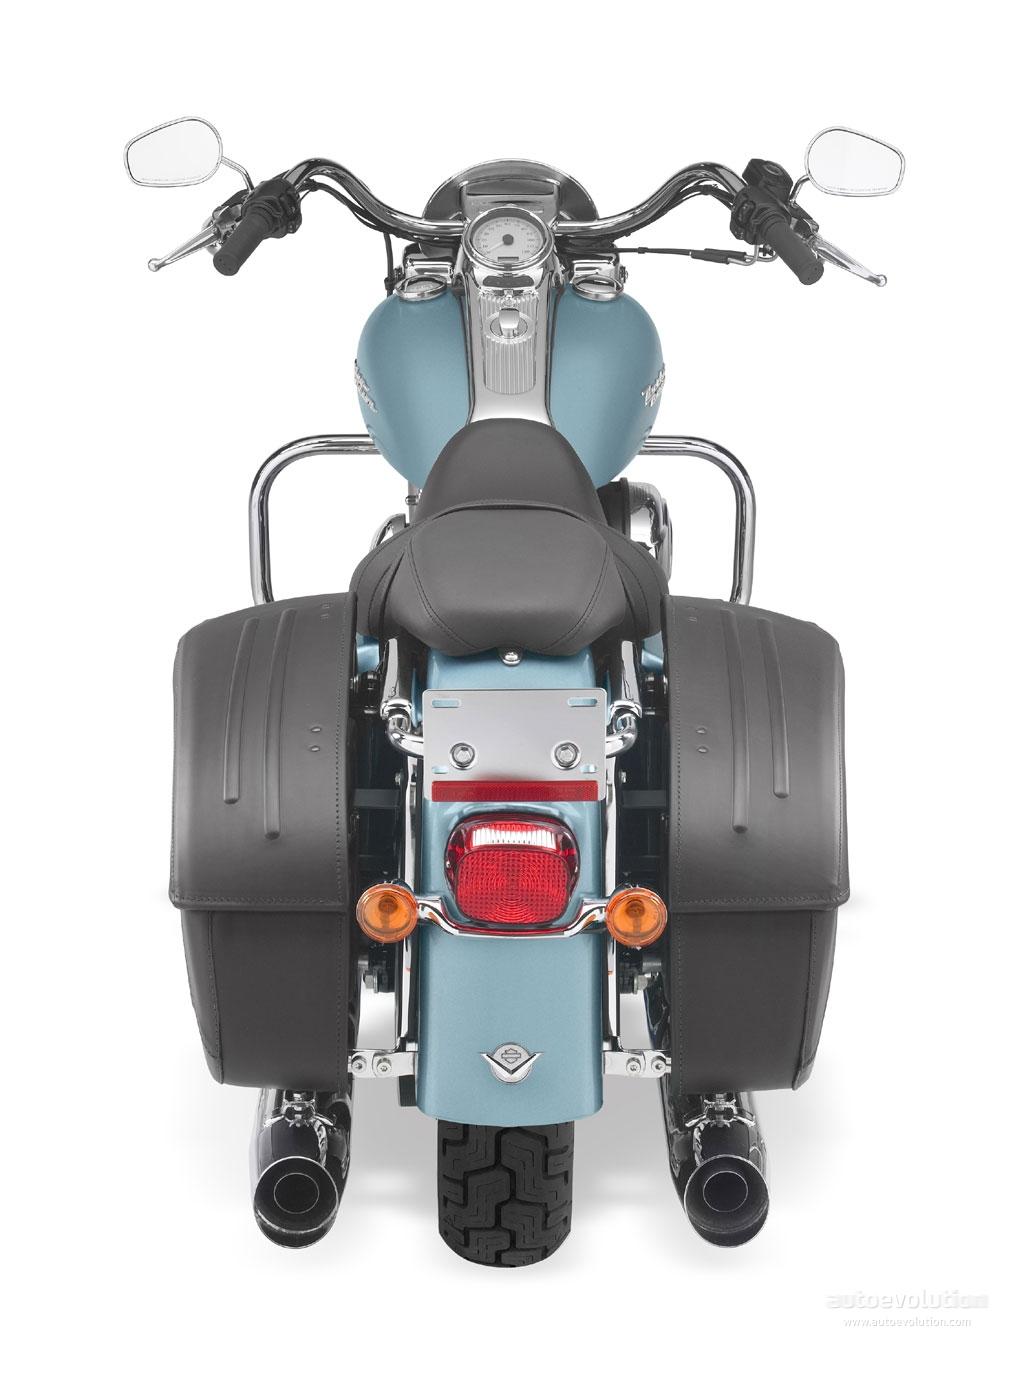 Electric Road Bike >> HARLEY DAVIDSON Road King Custom specs - 2006, 2007 - autoevolution